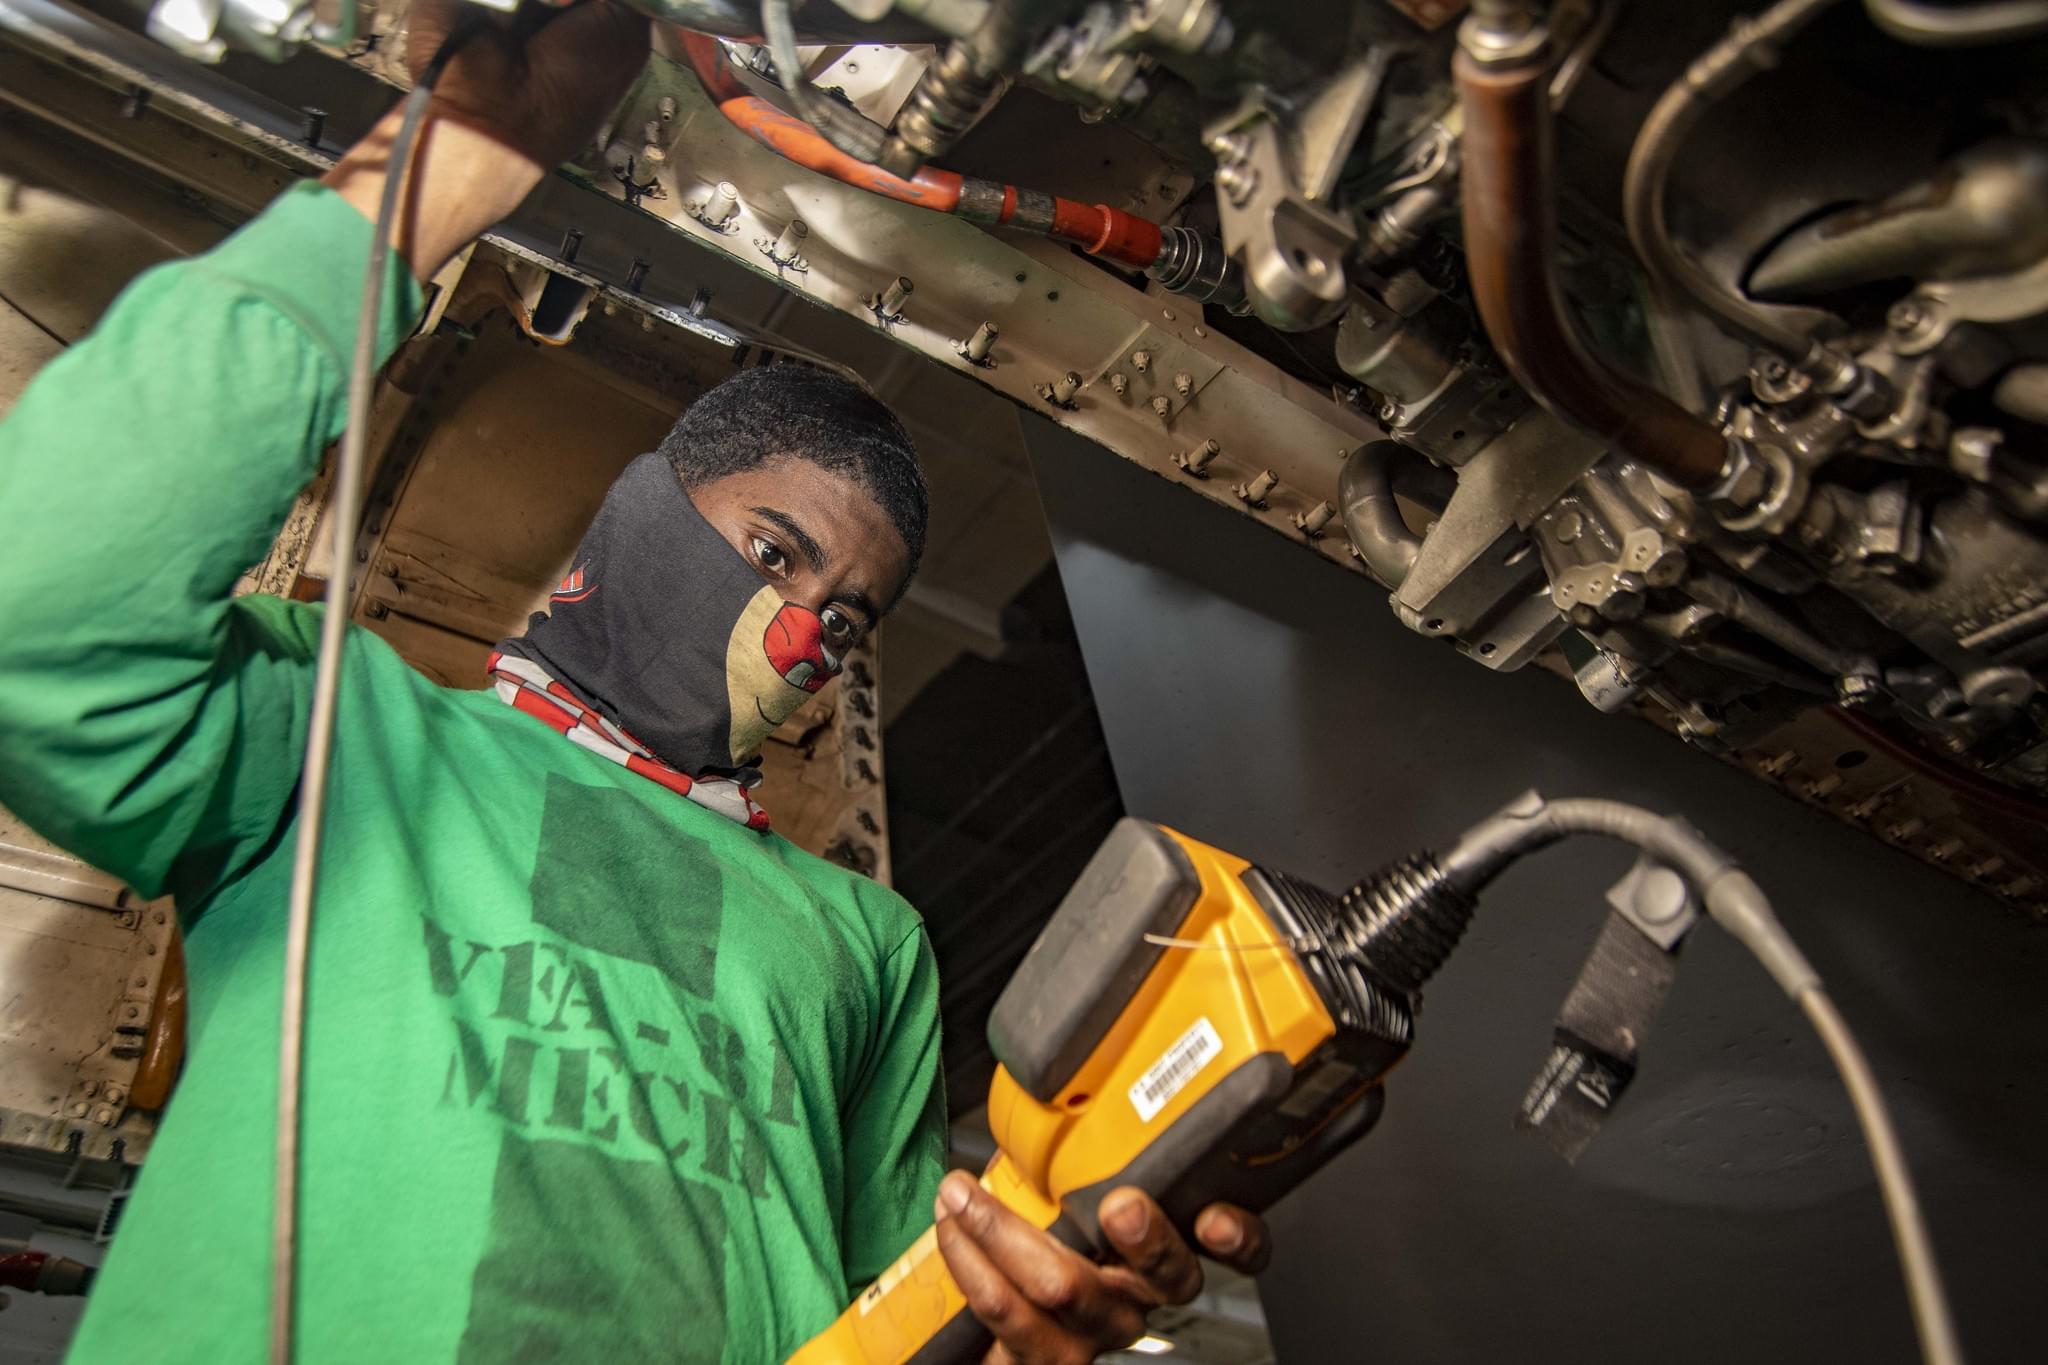 Military Spotlight: Newport News Sailor Inspects Engine on Aircraft Aboard U.S. Navy Warship